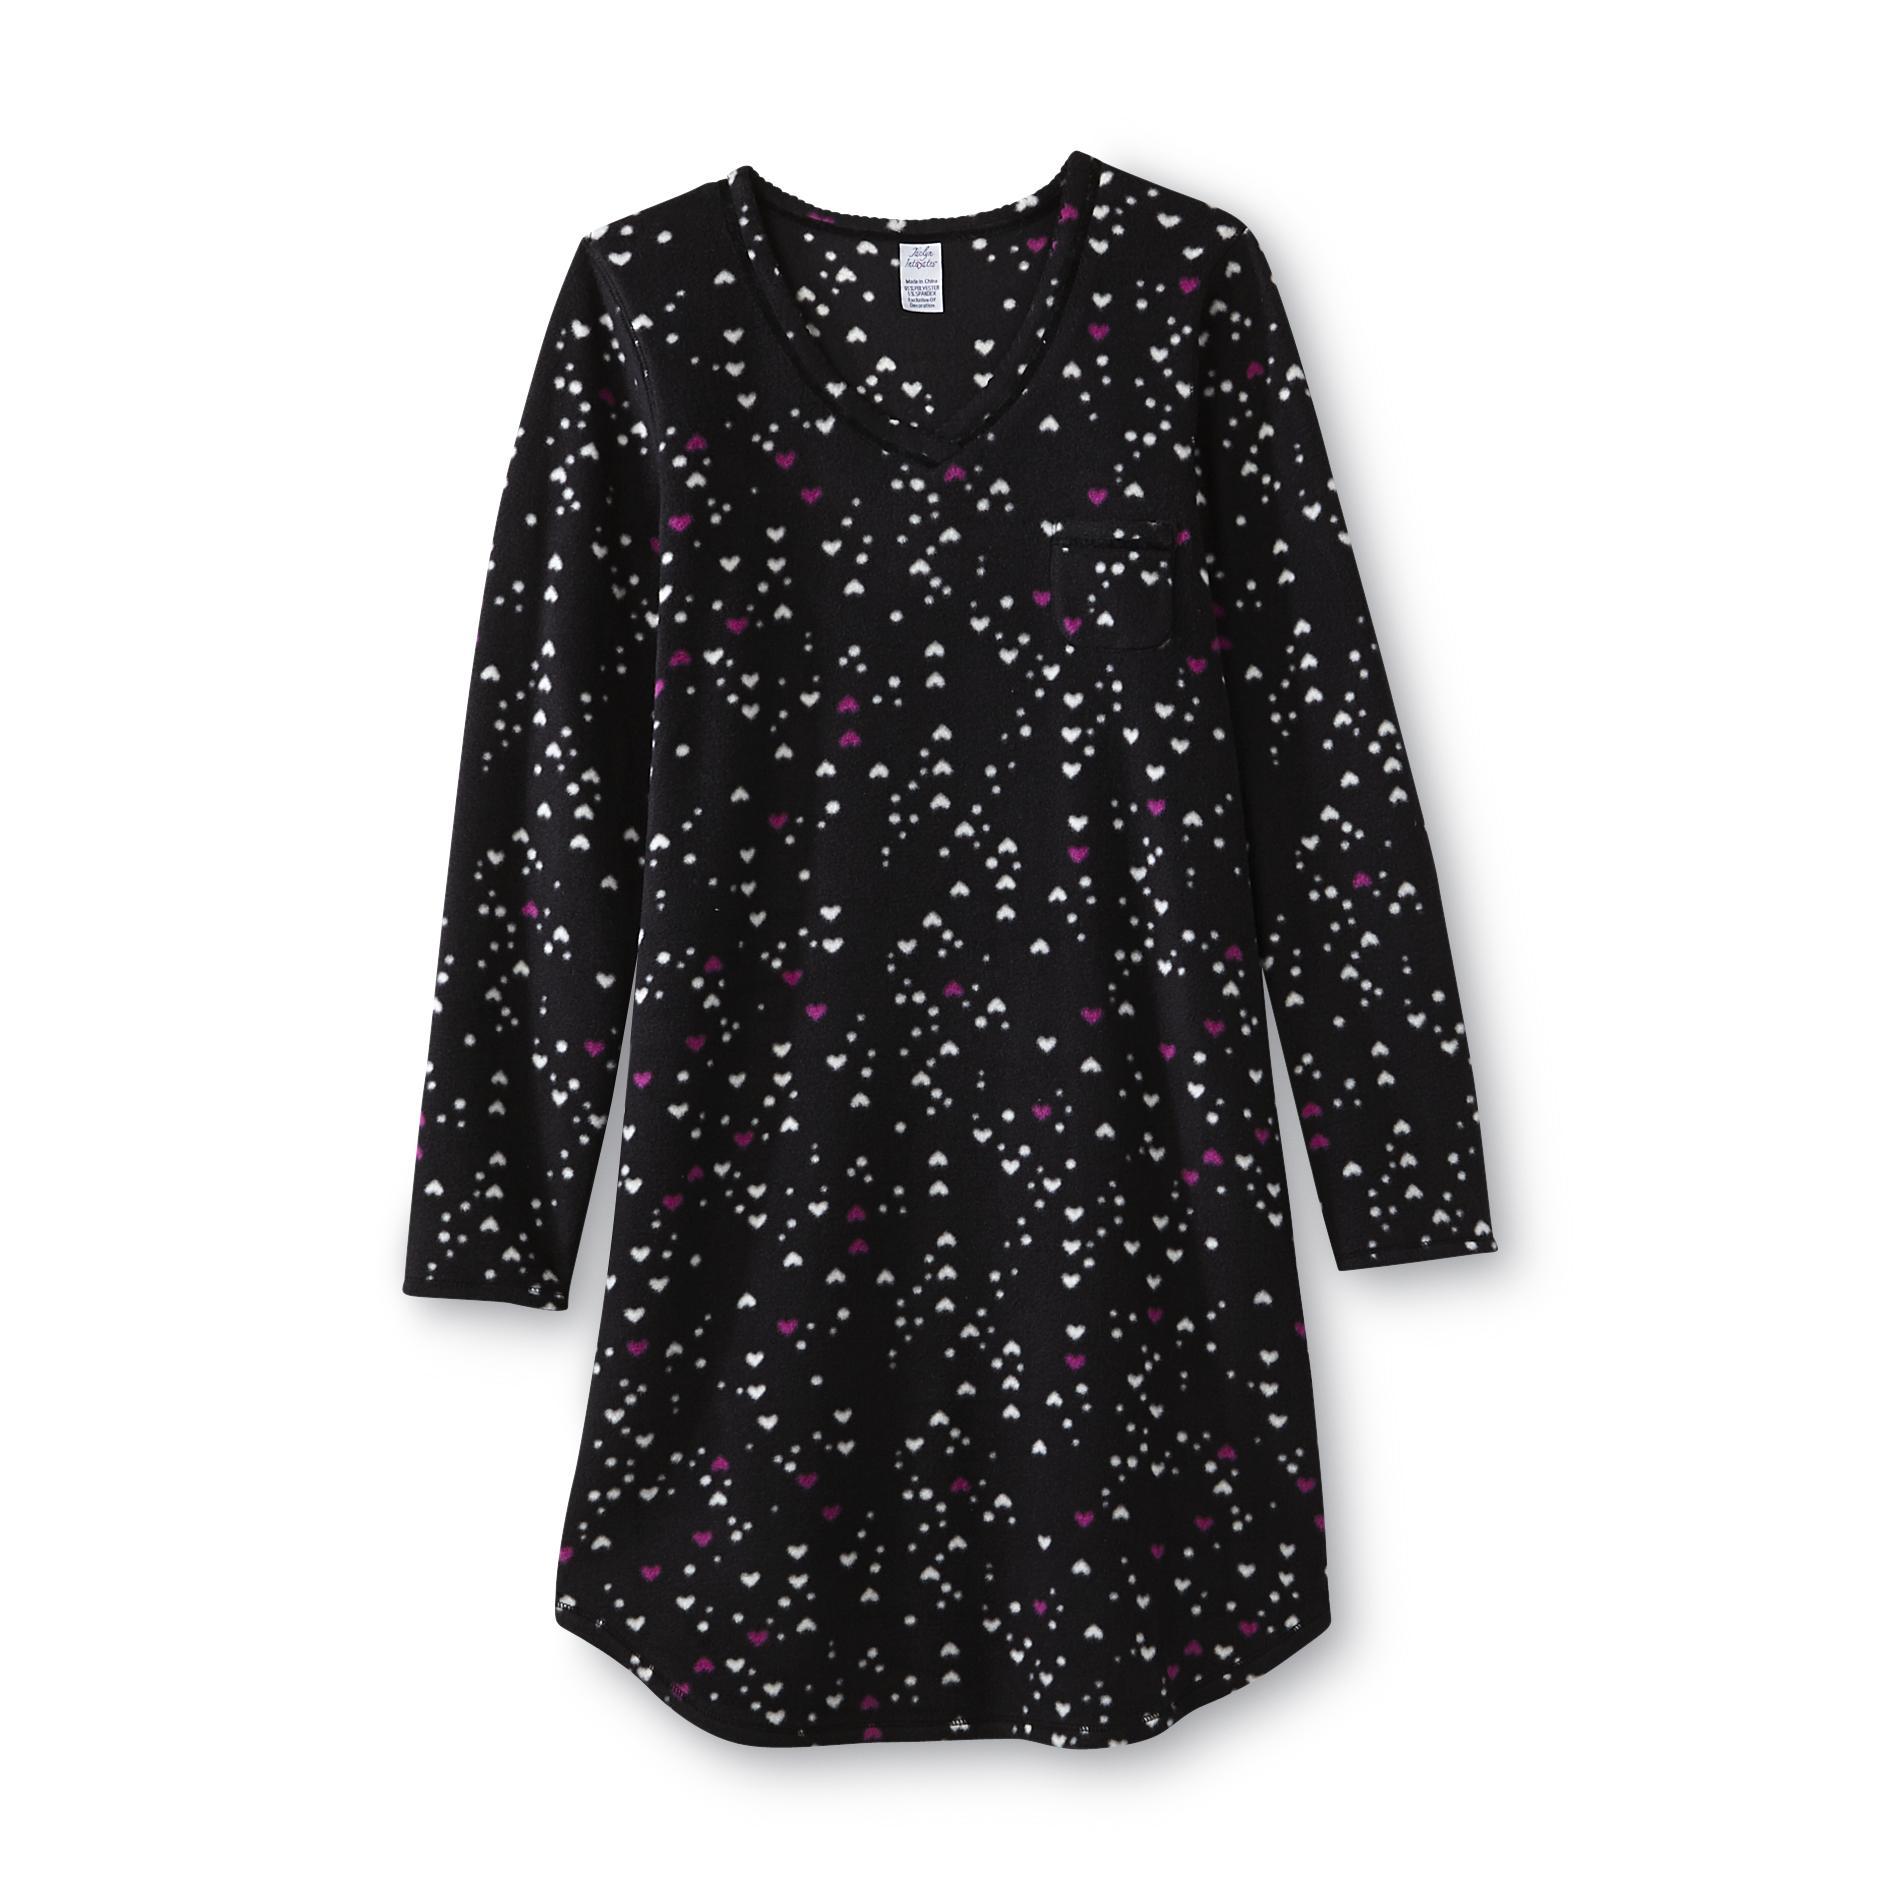 Jaclyn Intimates Women' Microfleece Nightshirt - Heart Clothing